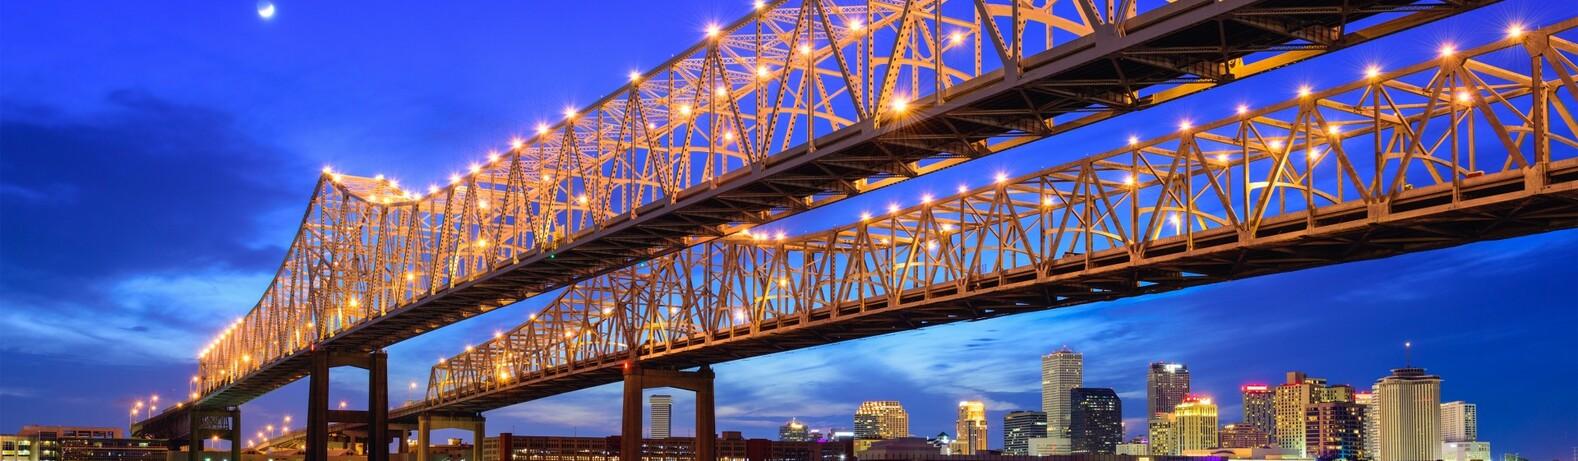 New Orleans  - Louisiana